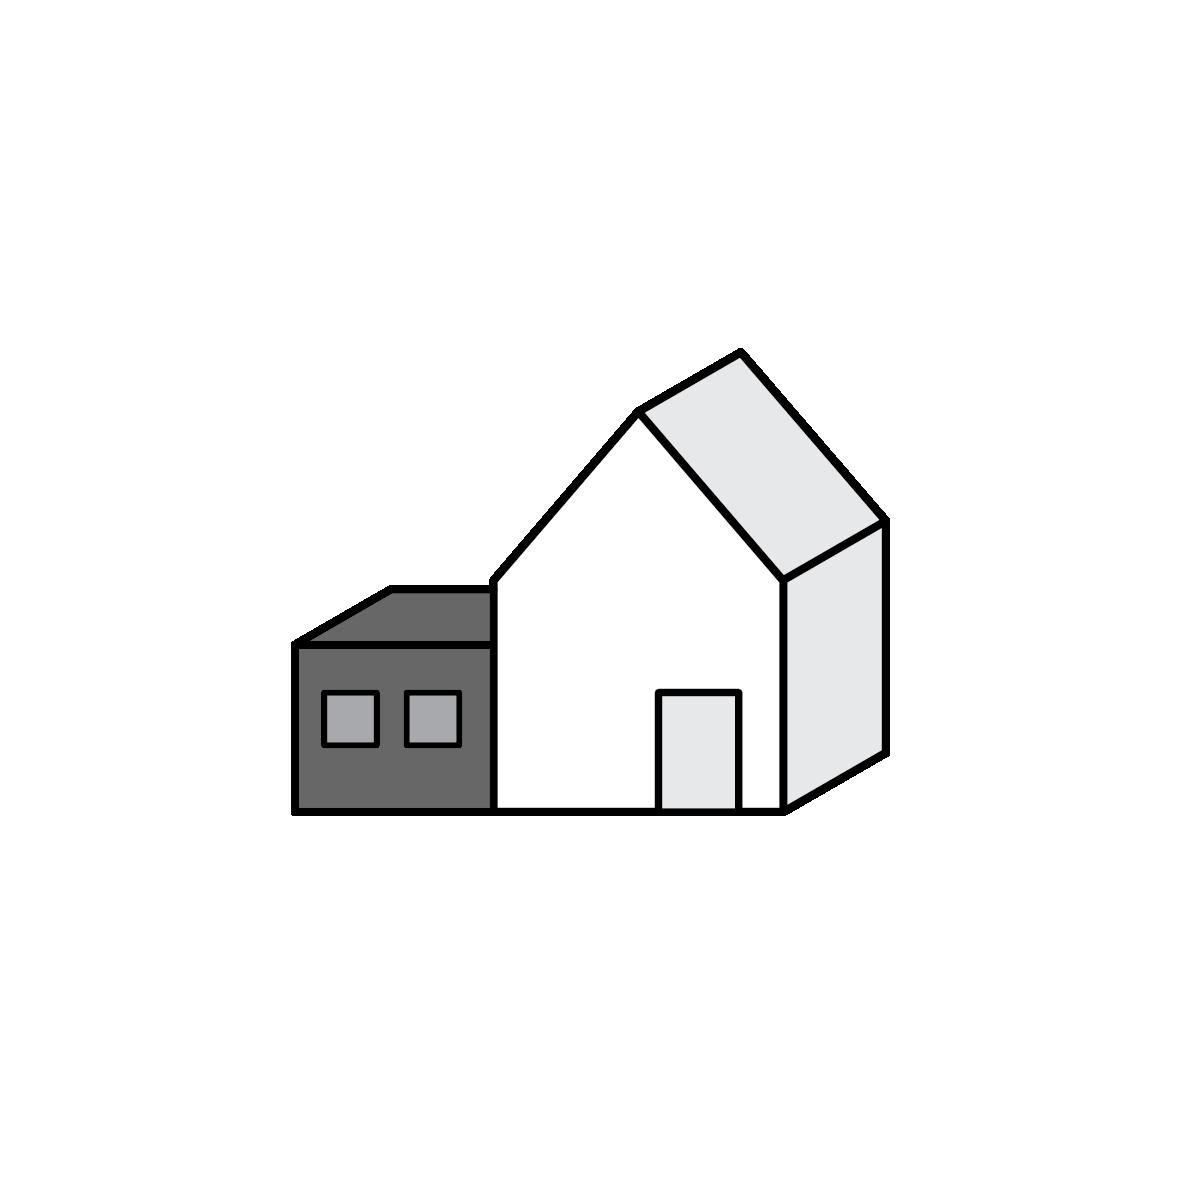 Woonuitbreiding-1925402220